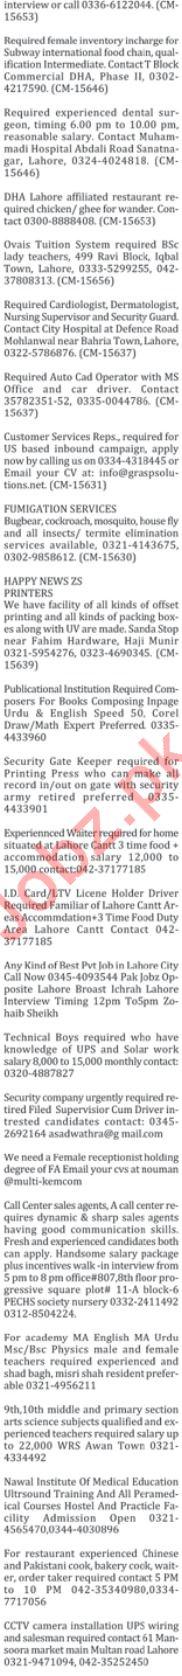 Male & Female Staff Jobs Open in Islamabad 2019 Job